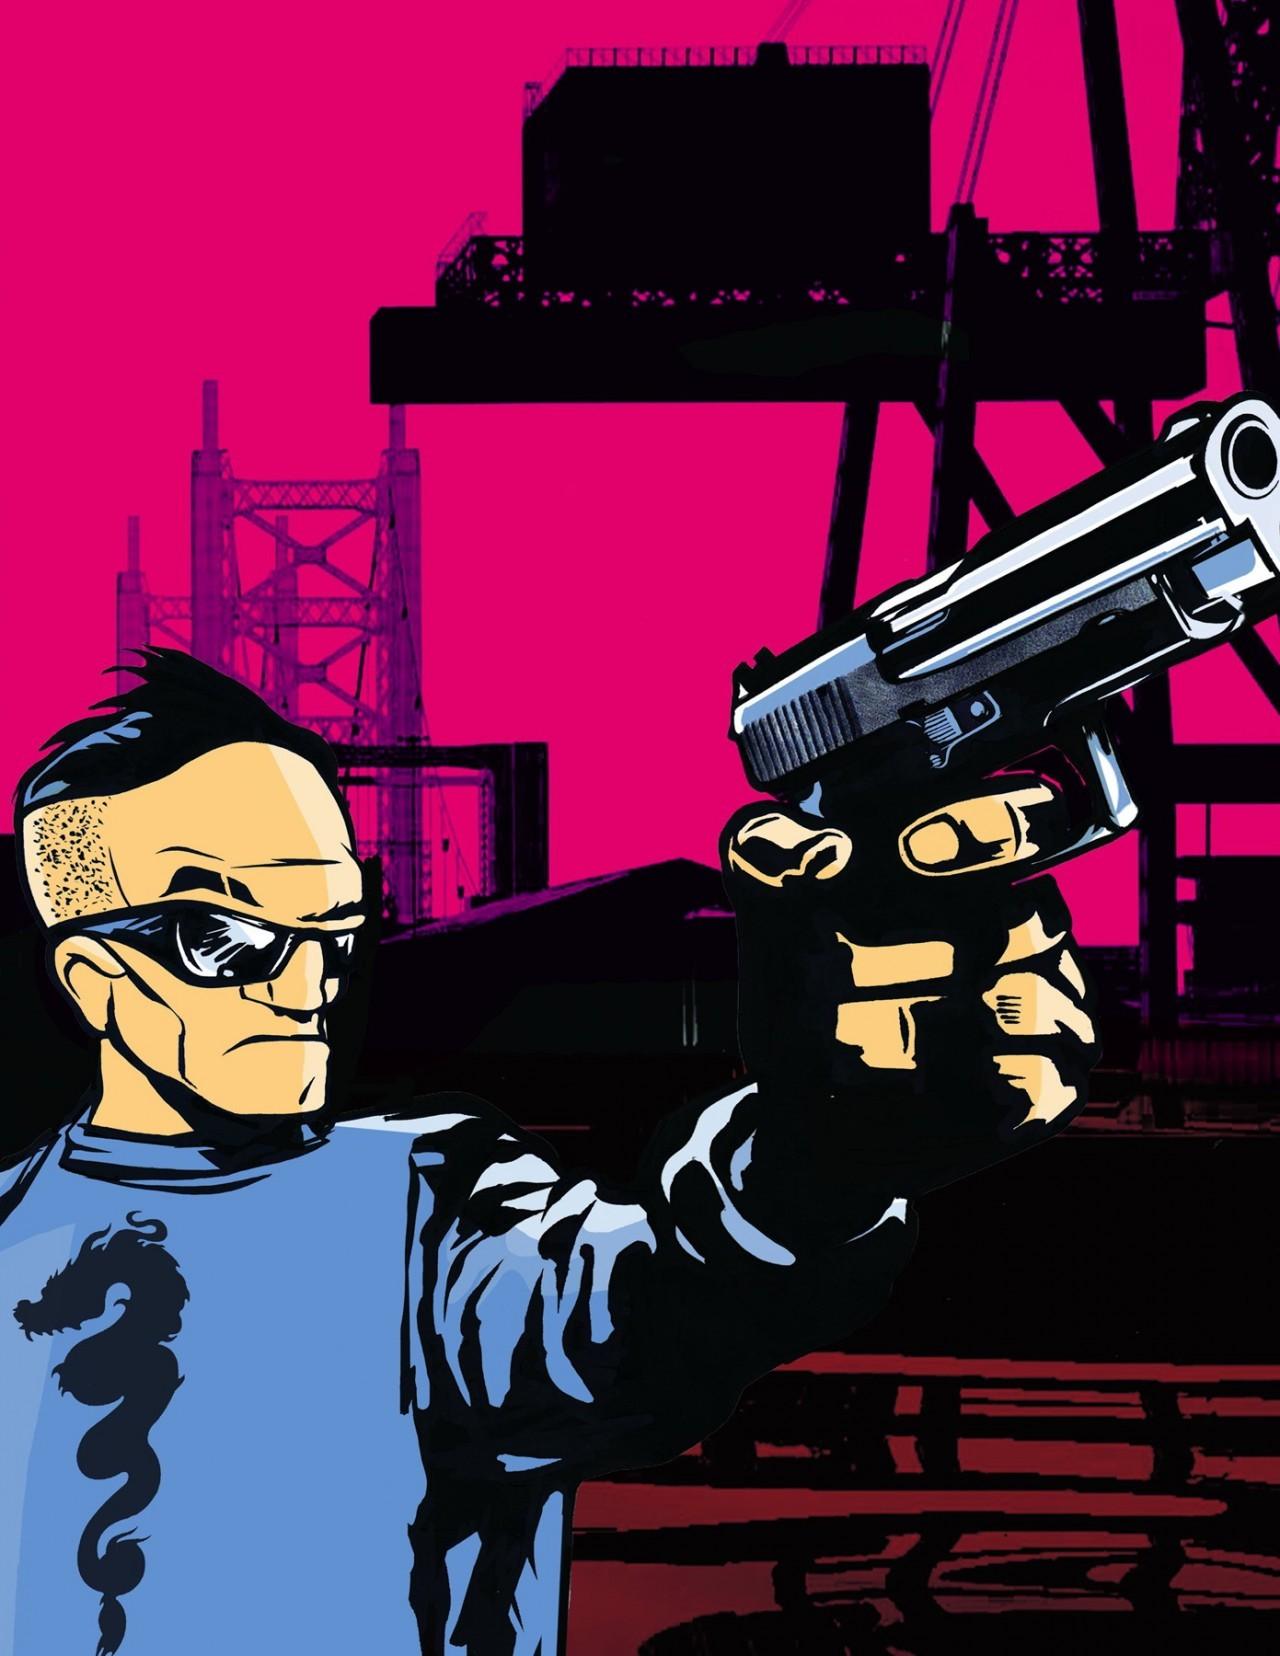 Artworks Grand Theft Auto III